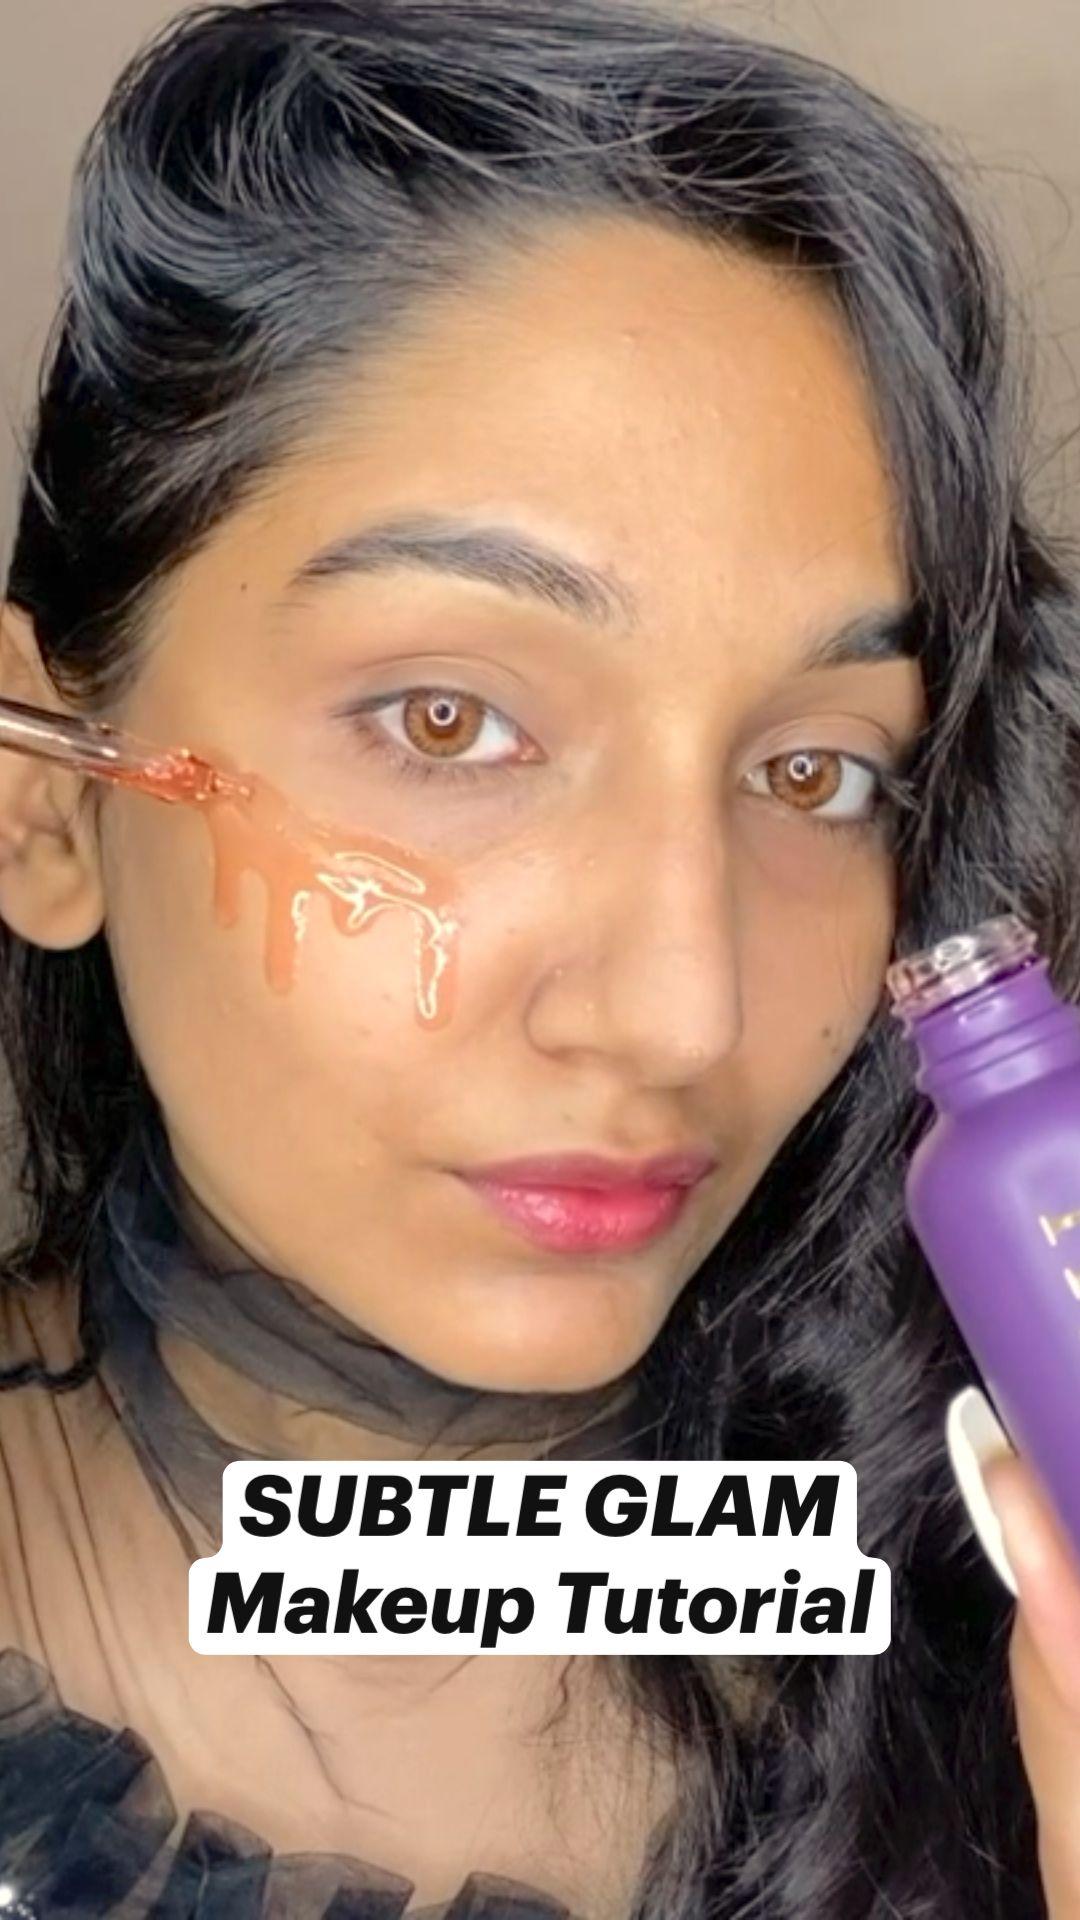 SUBTLE GLAM Makeup Tutorial